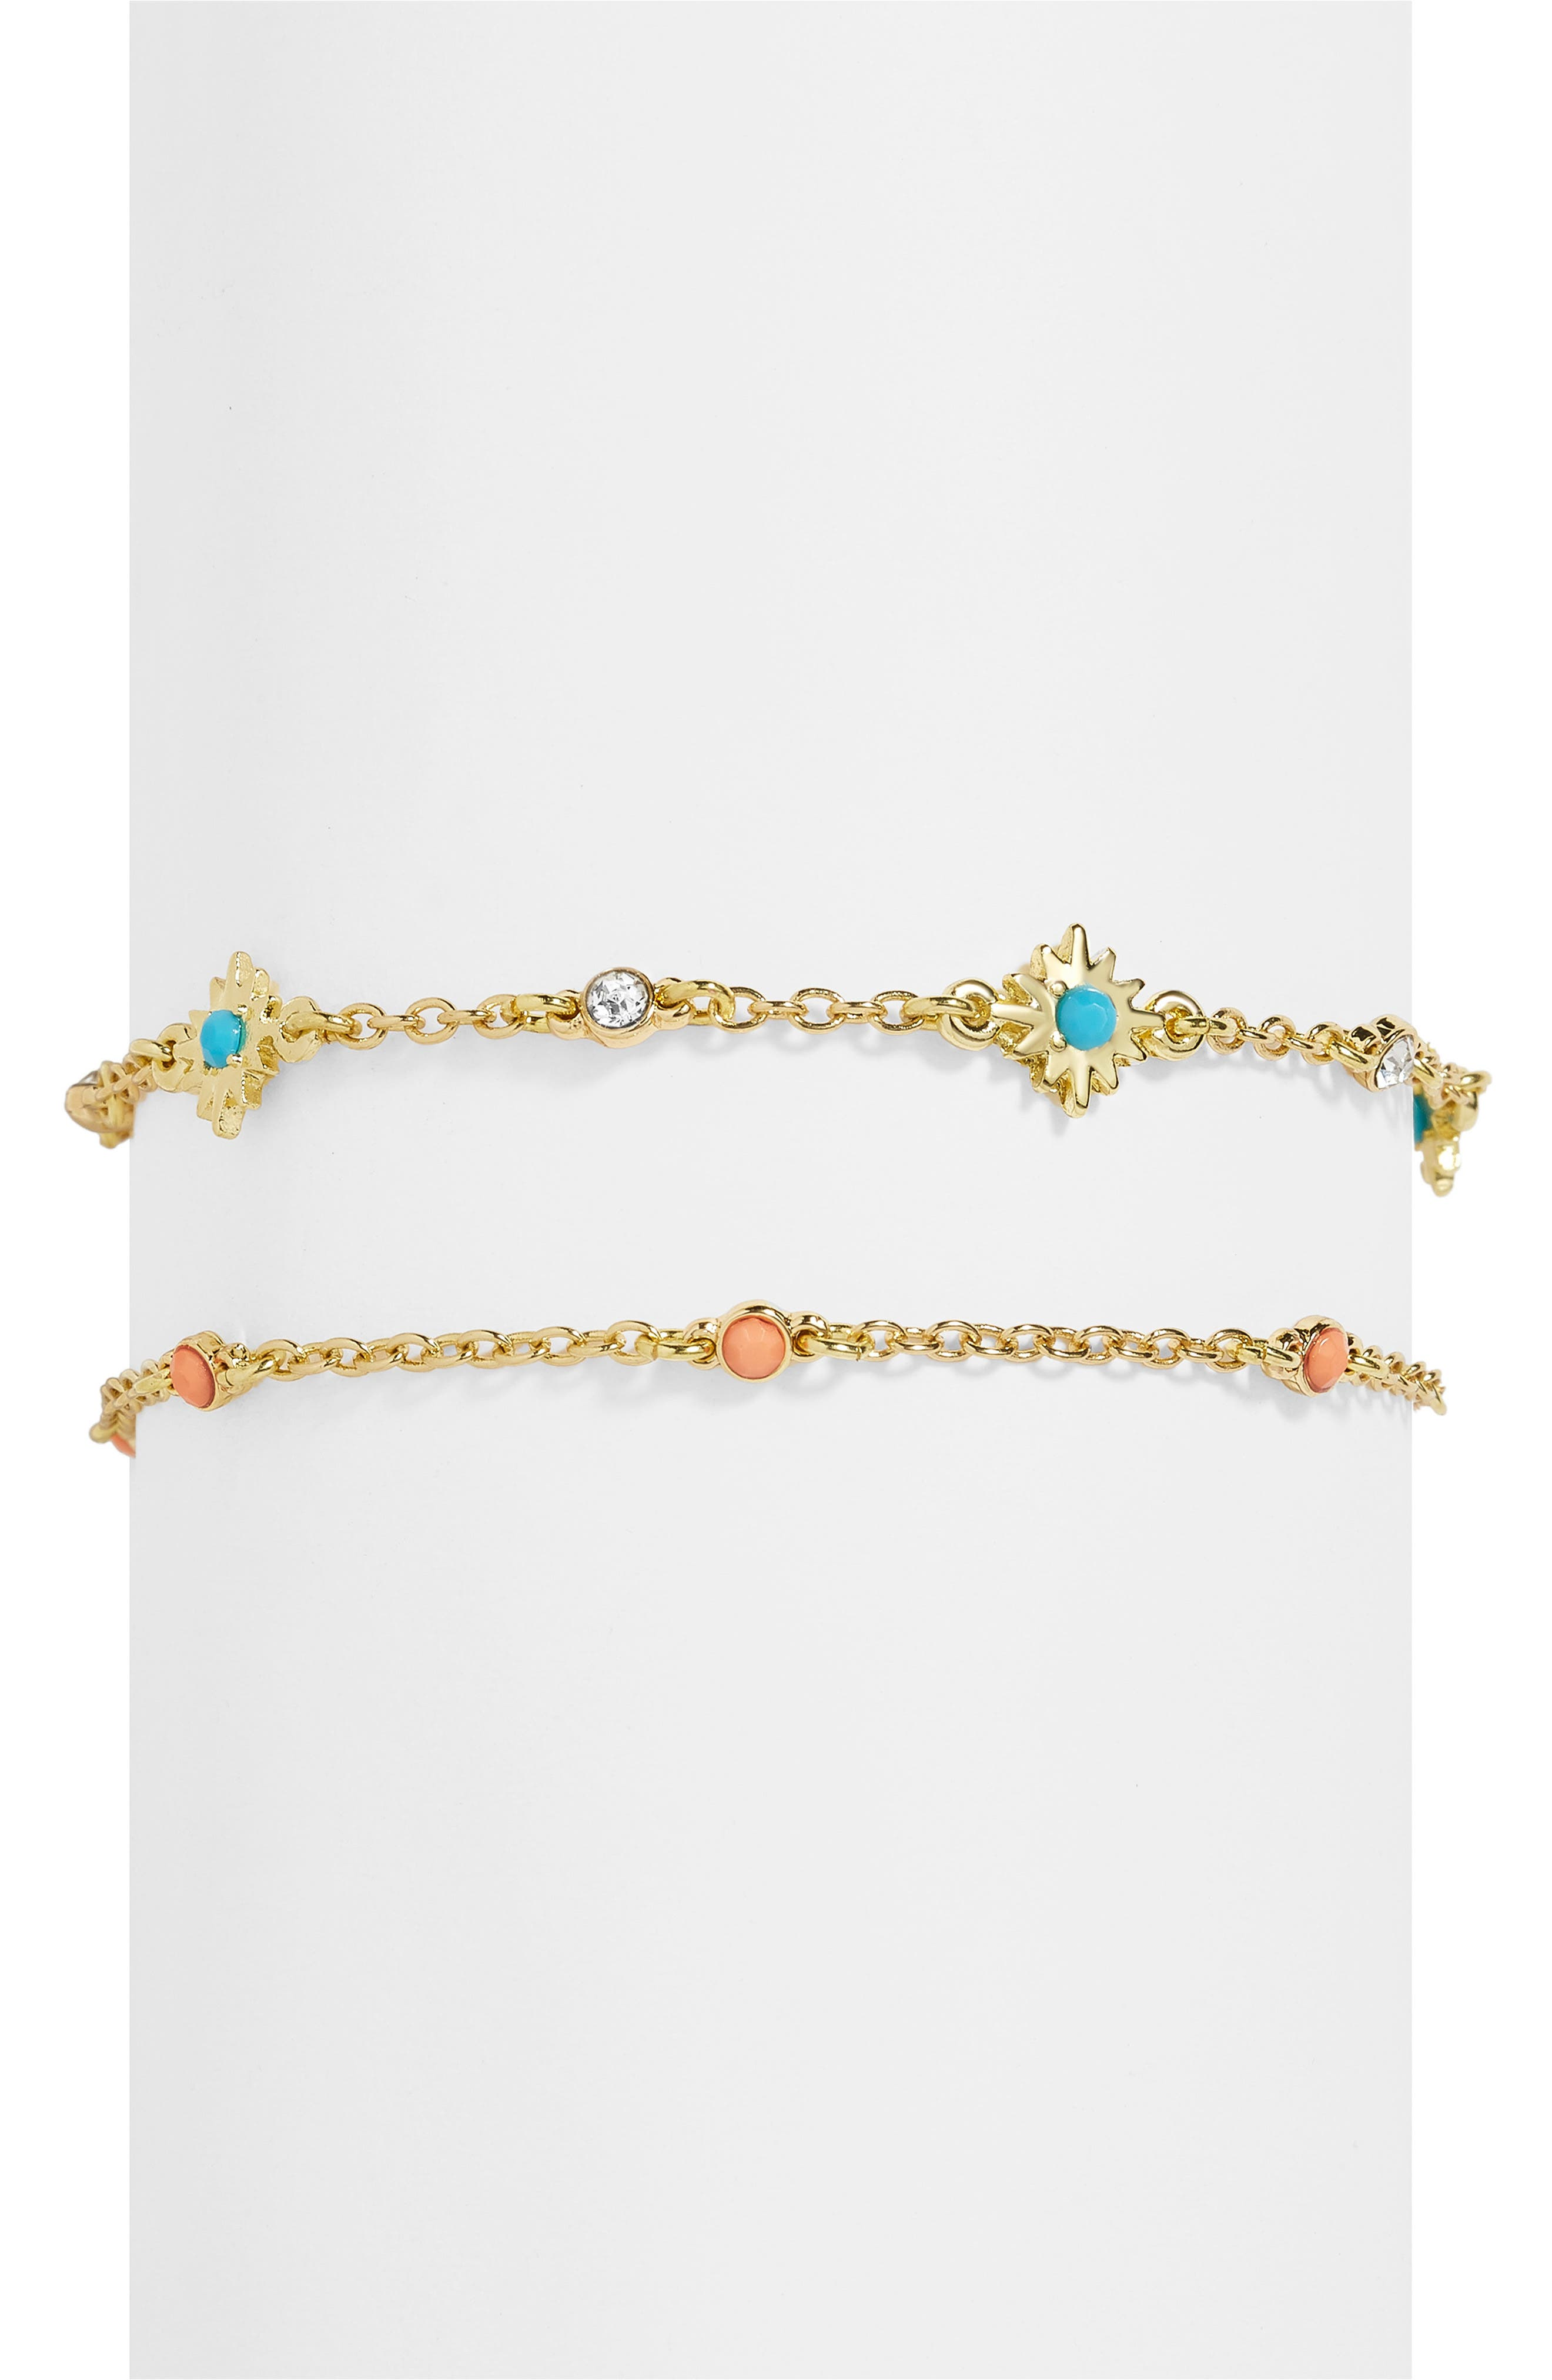 Set of 2 Nova Bracelets,                         Main,                         color, BLUE